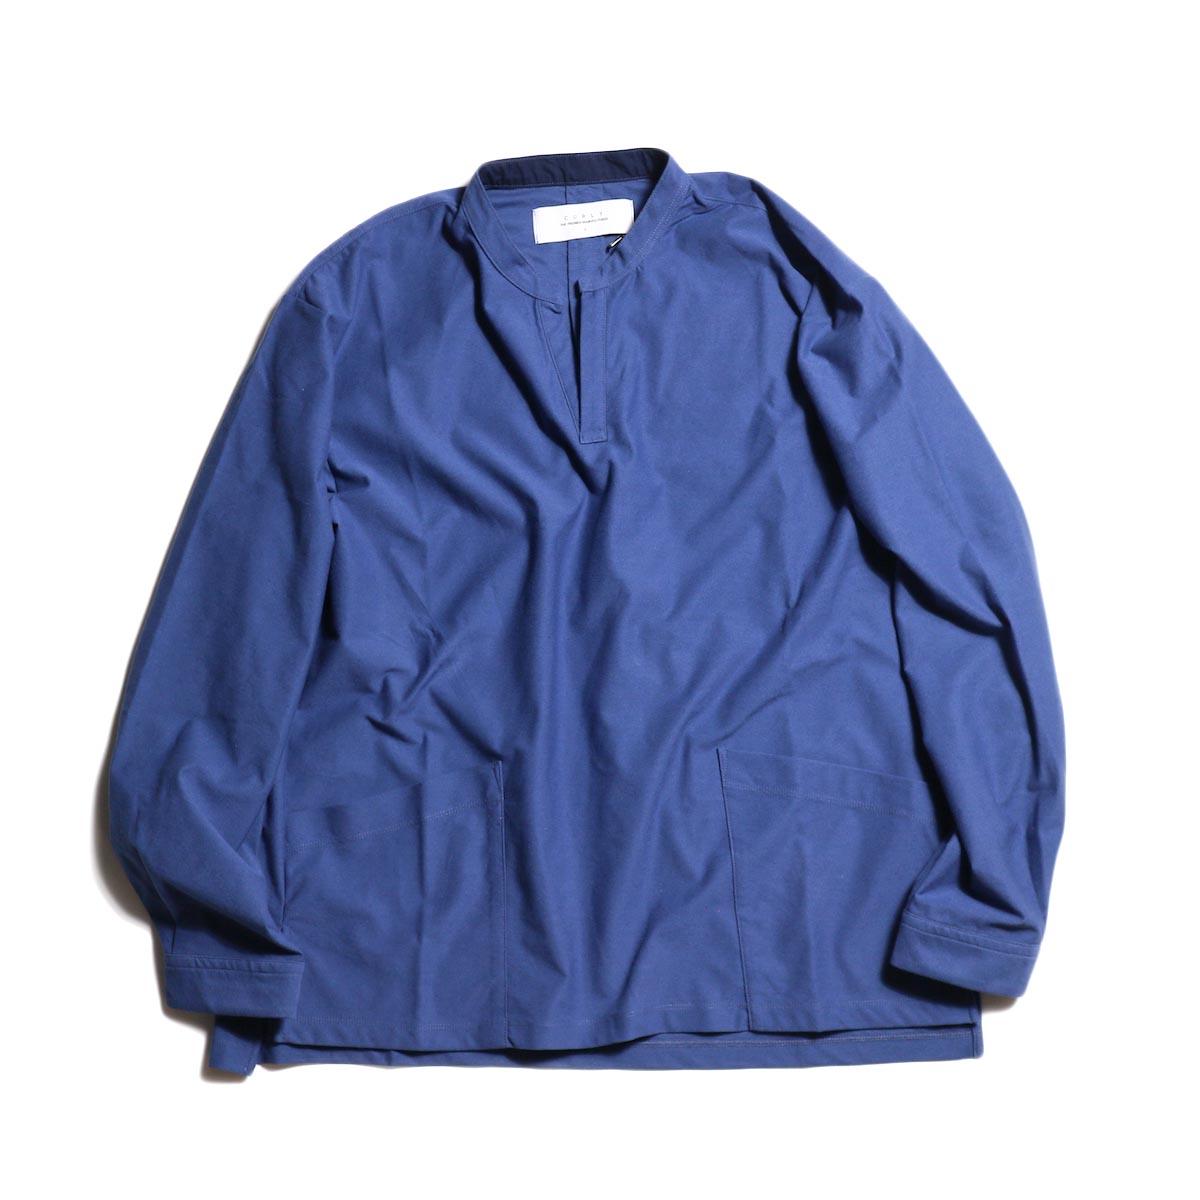 CURLY / NOMADIC LS SMOCK SHIRTS -BLUE